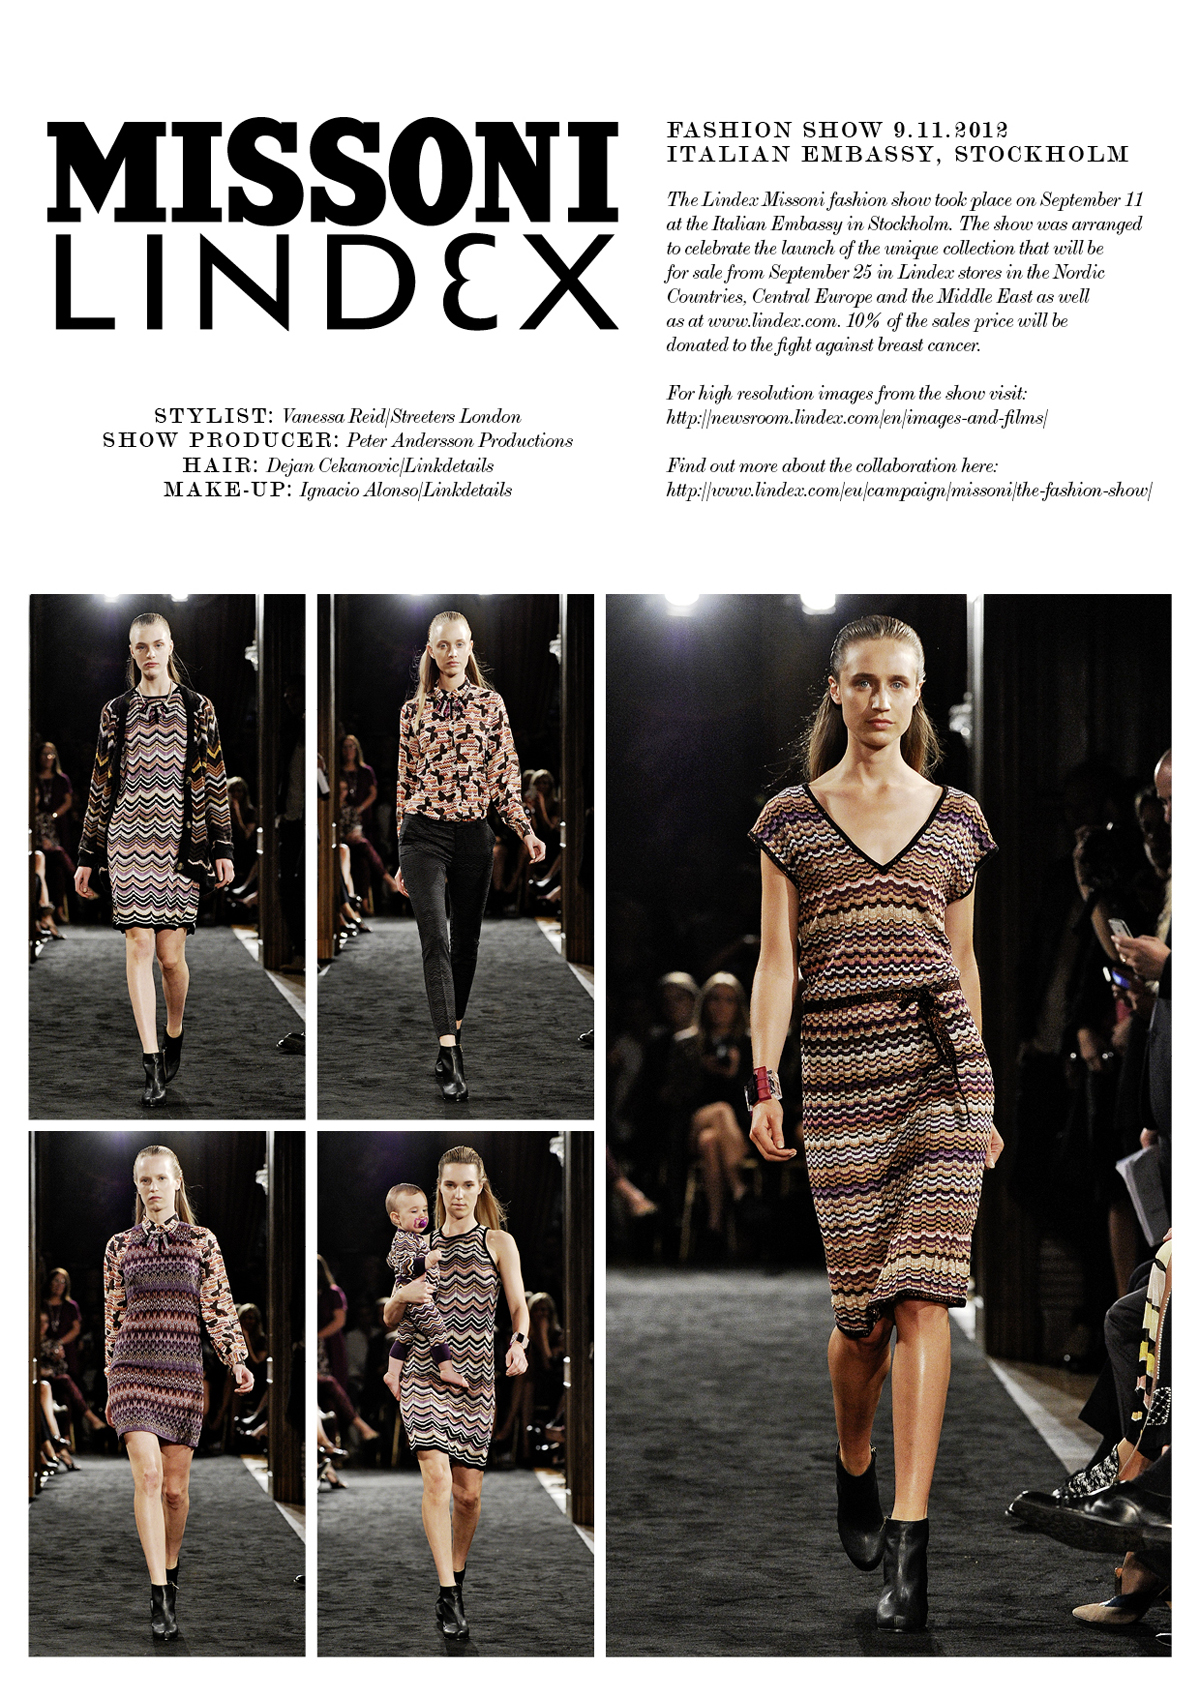 lindex missoni fashion show | lindex group